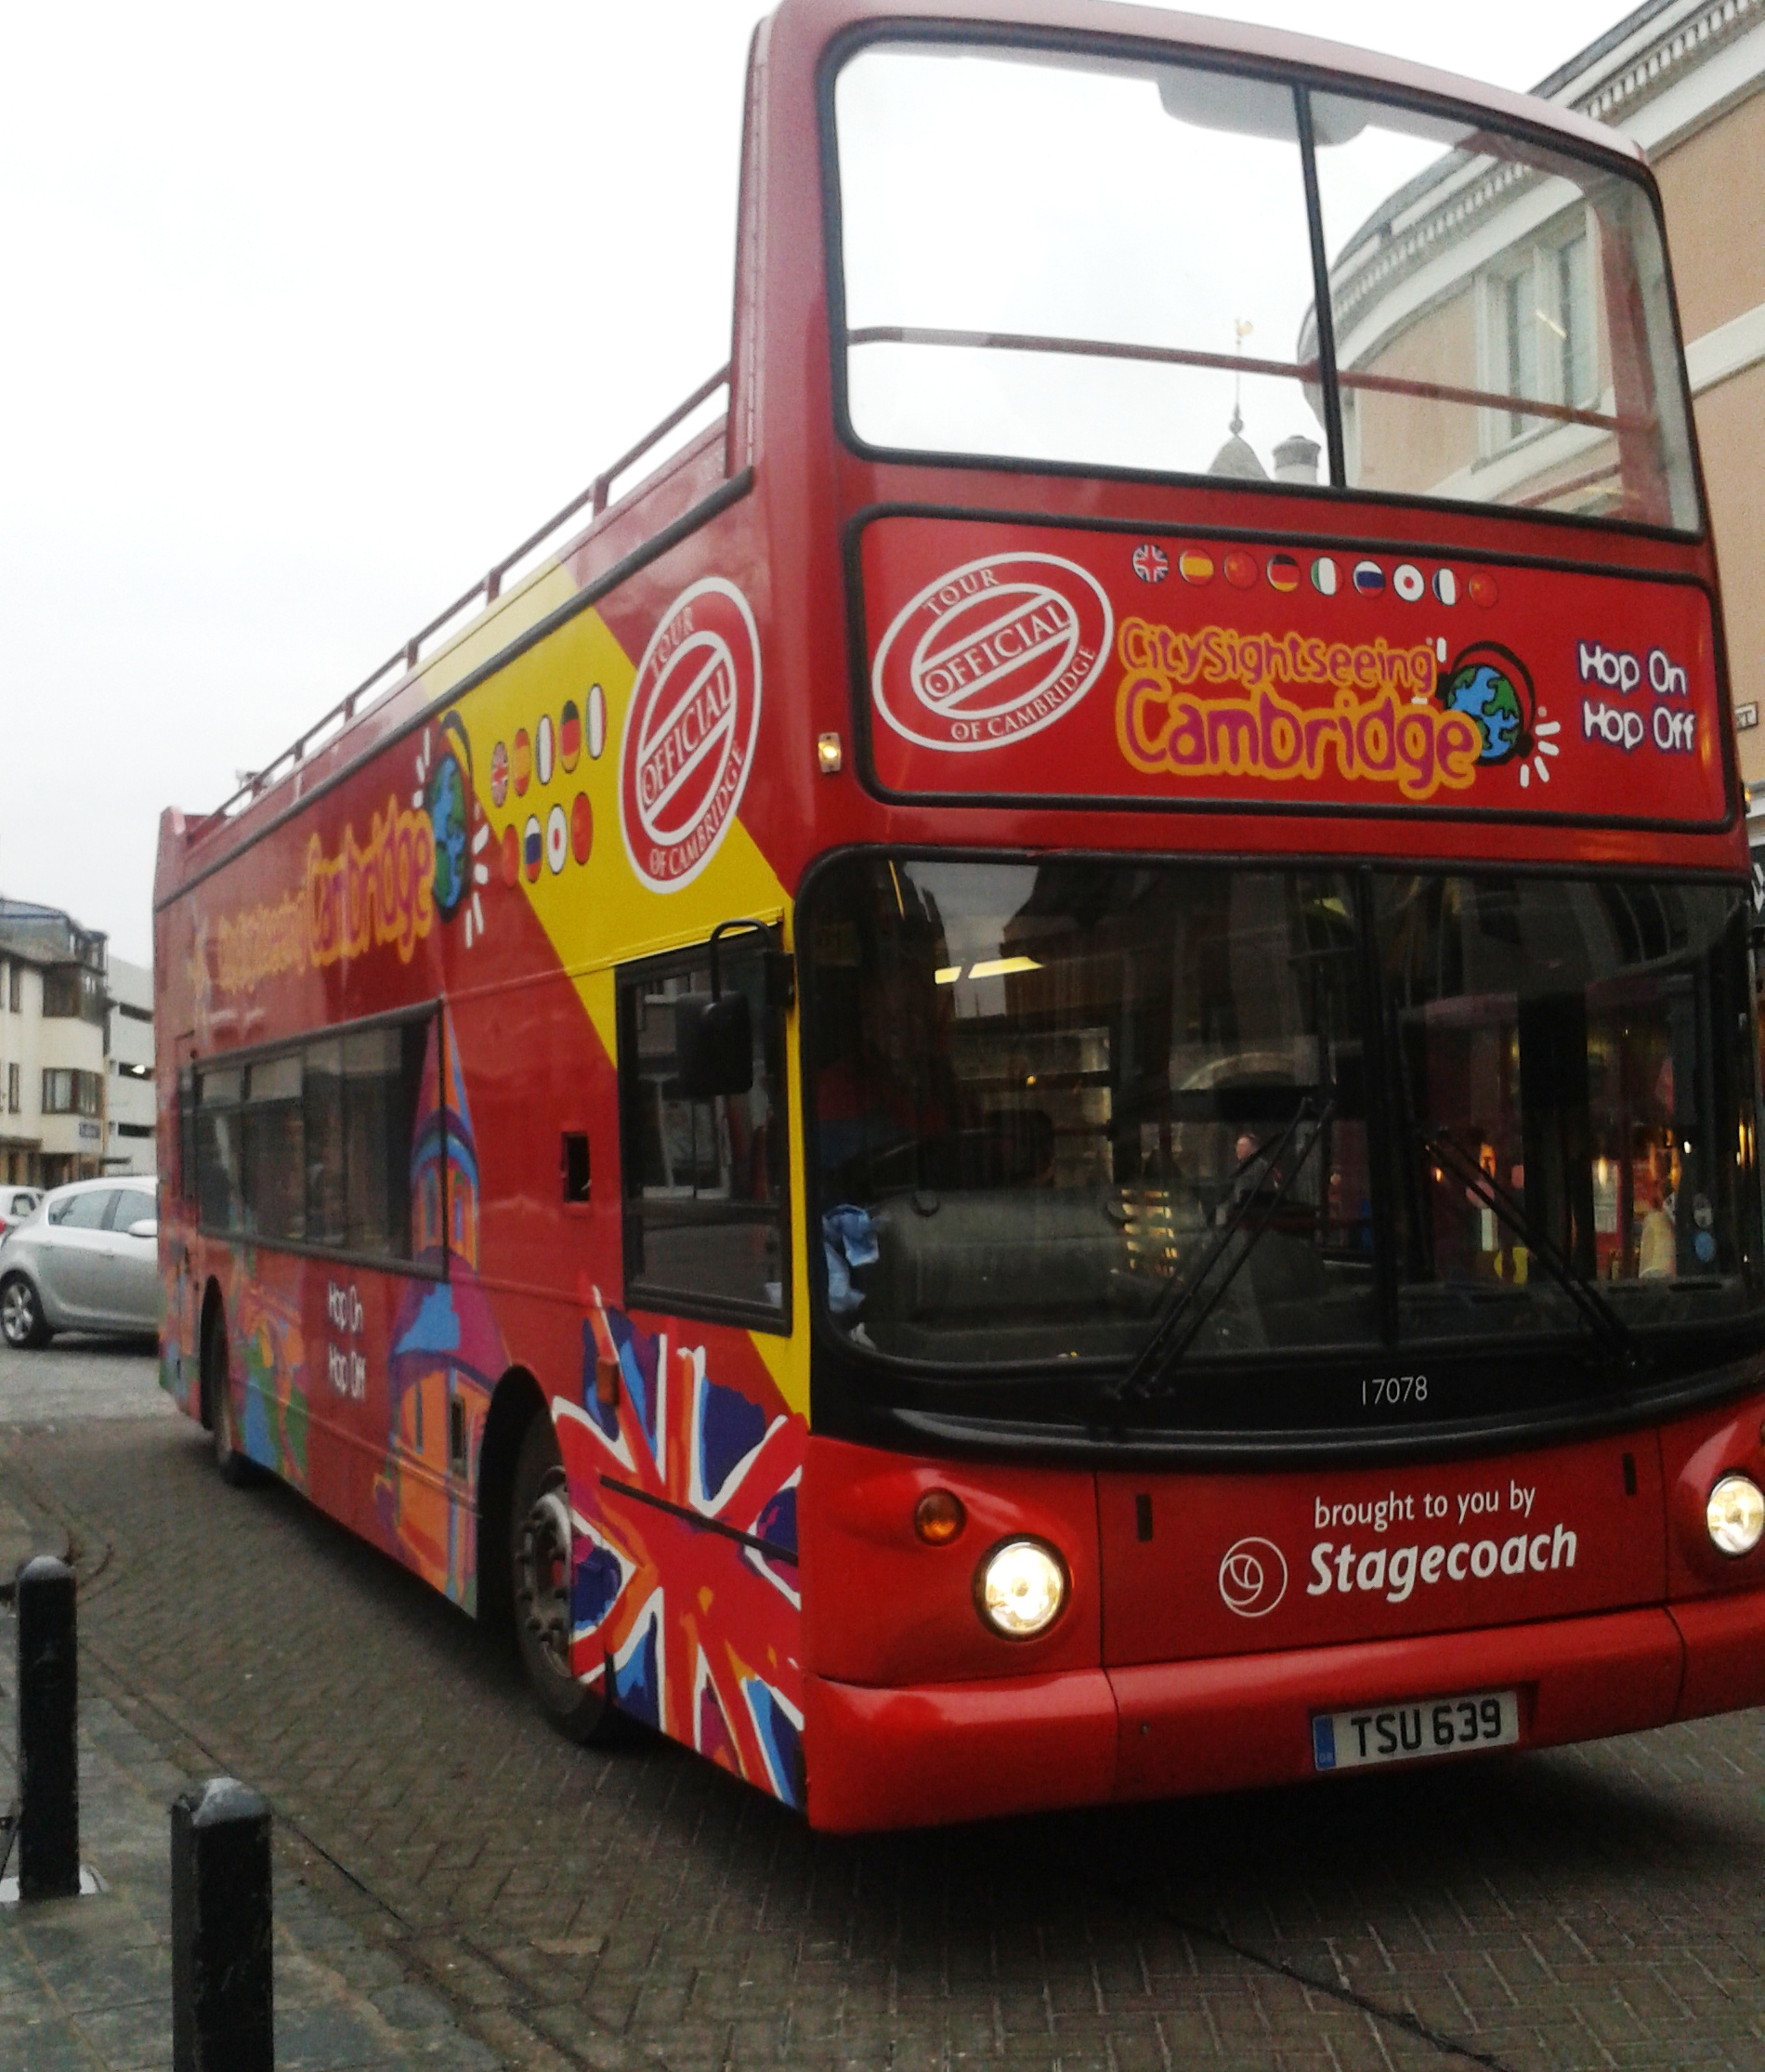 ônibus turístico, só para ilustrar que